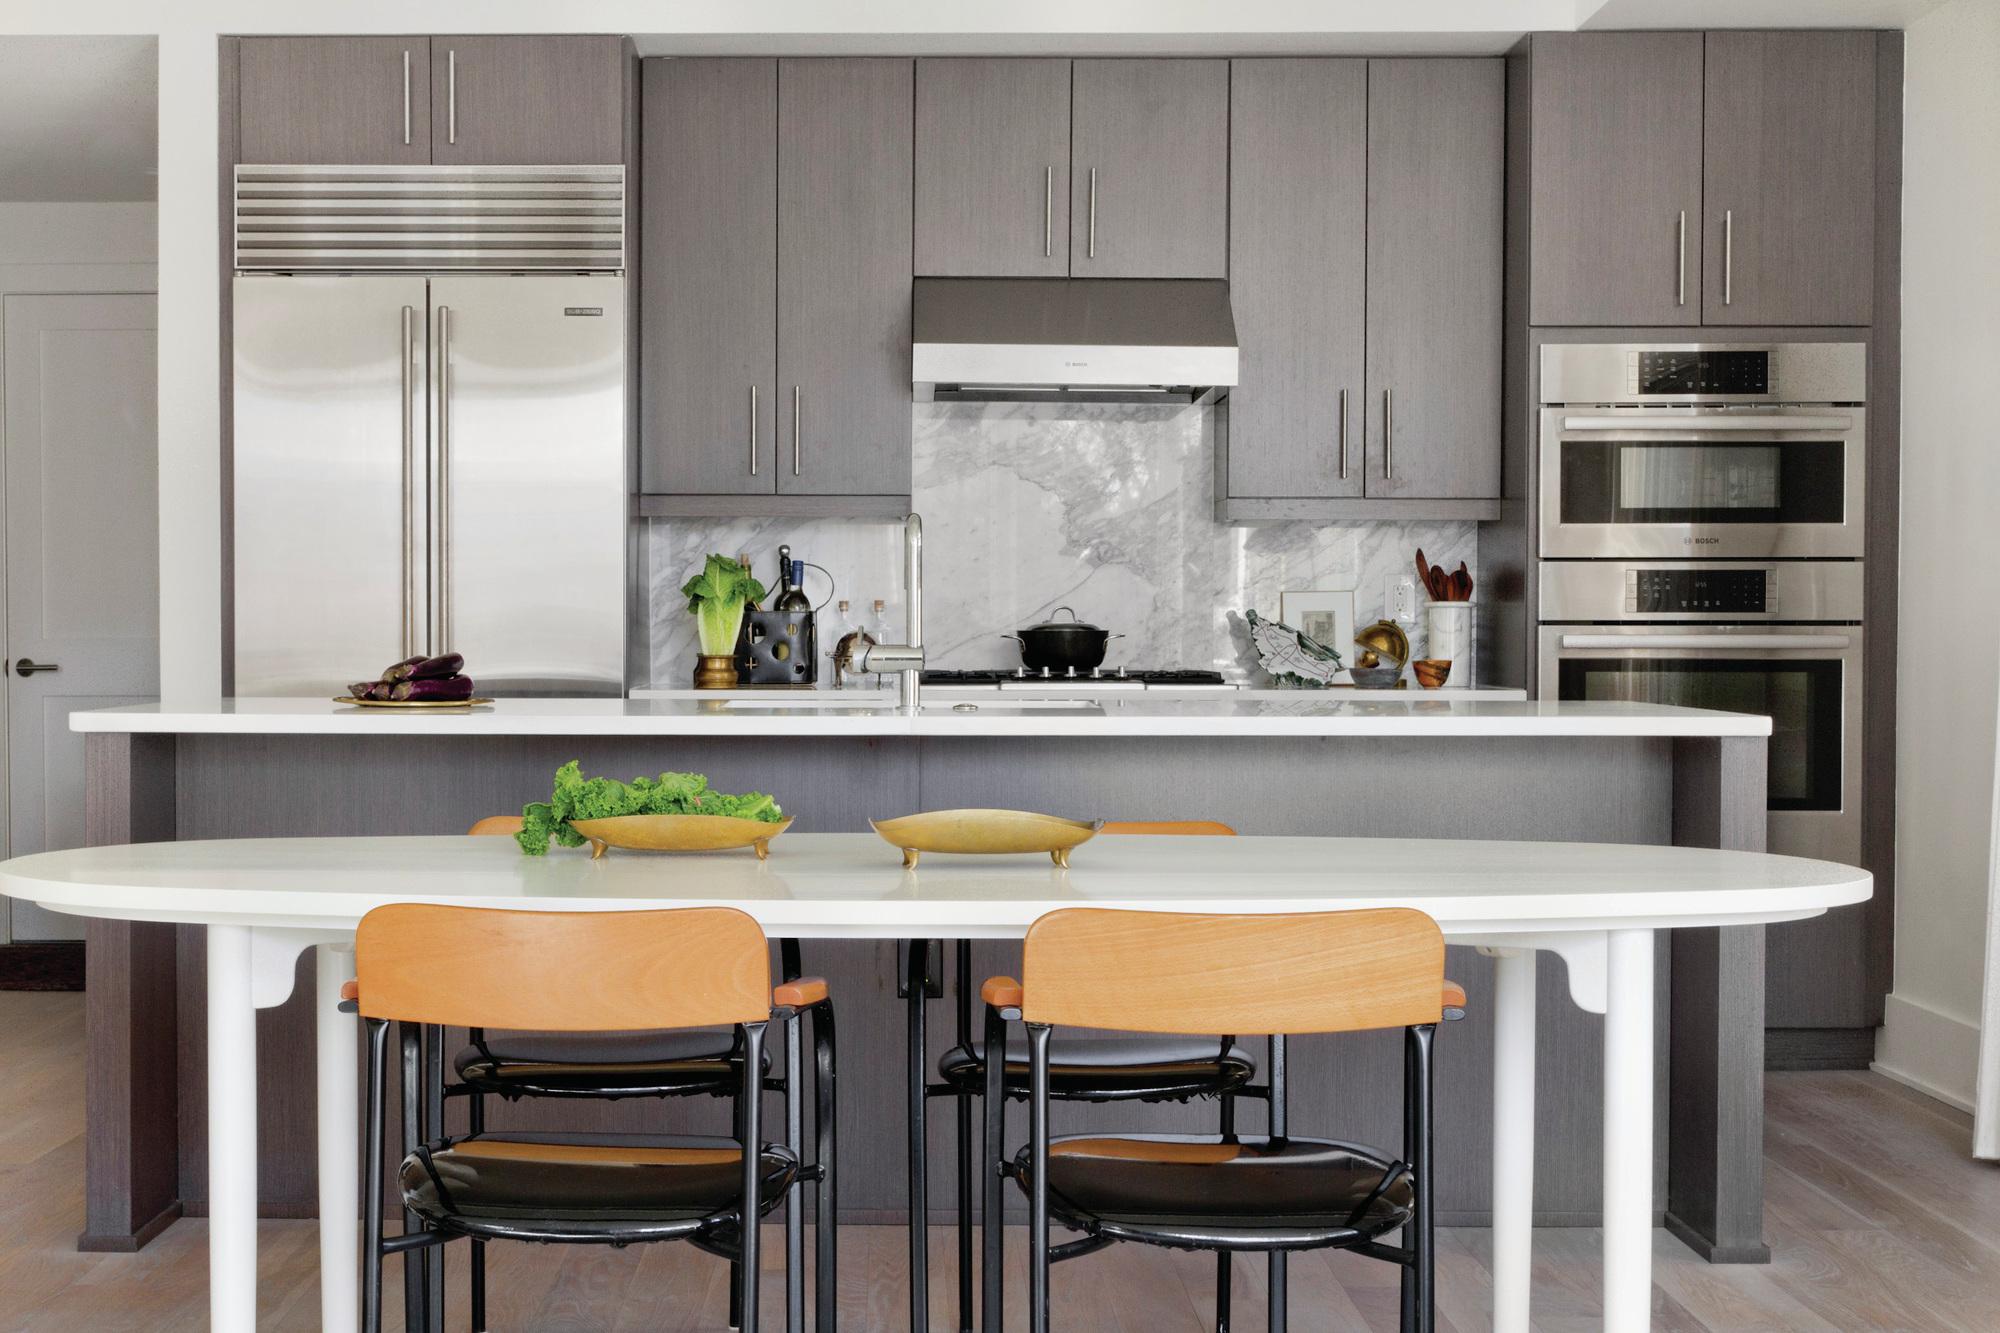 Houzz Kitchen Trends Survey Links New Kitchens To - Stone Patio Pavers